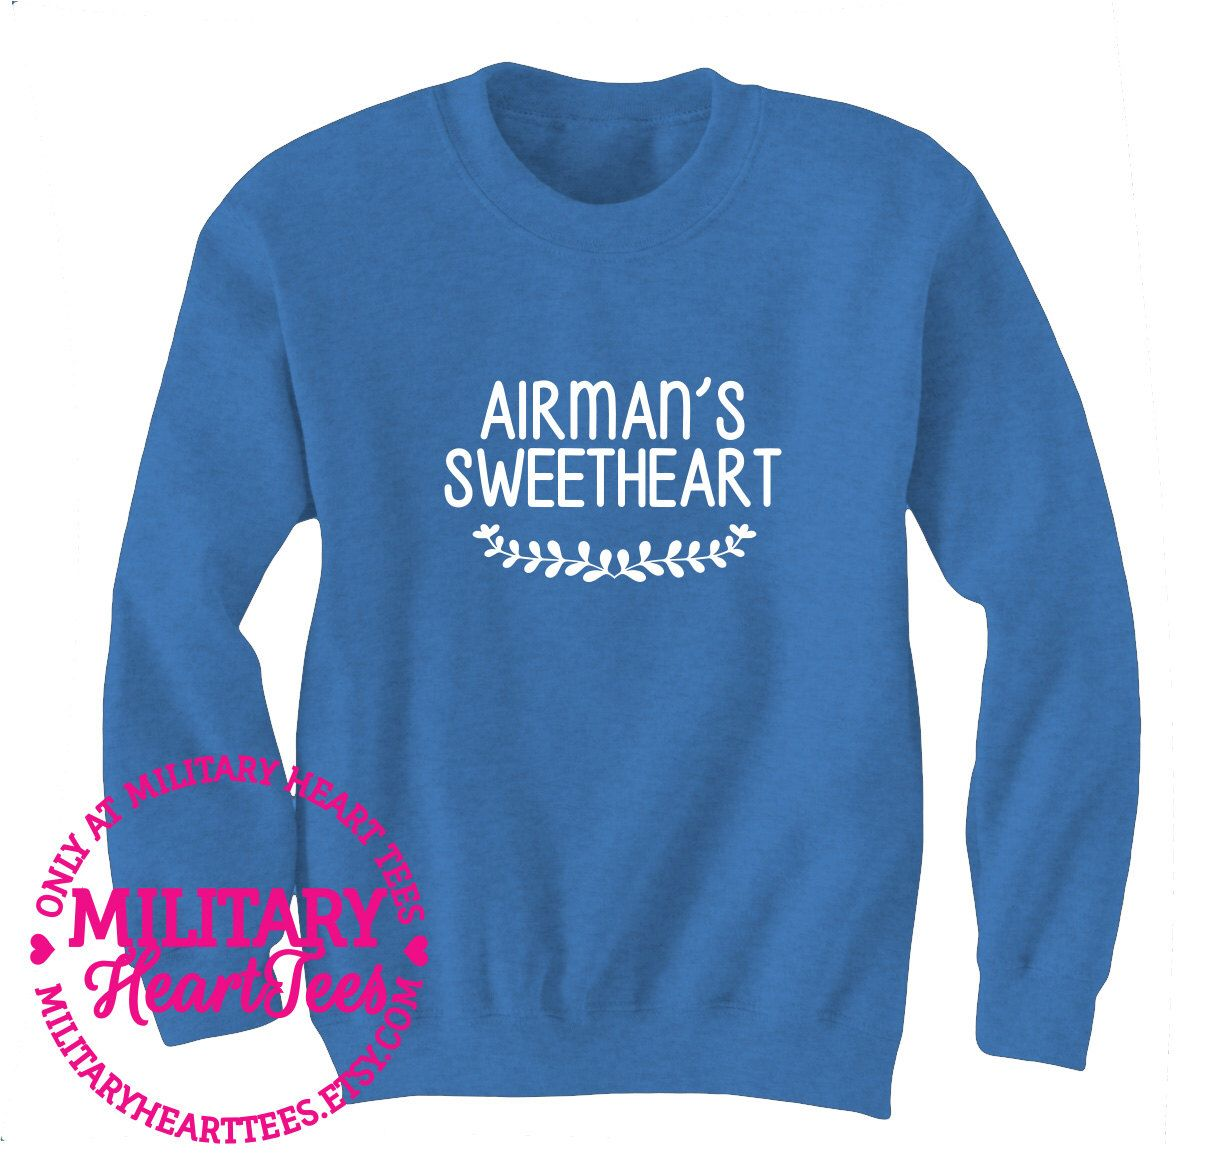 Custom Airman S Sweetheart Crewneck Sweatshirt Air Force Sweatshirt Air Force Wife Shirt Air Force Air Force Wife Shirt Air Force Sweatshirt Navy Wife Shirt [ 1171 x 1230 Pixel ]